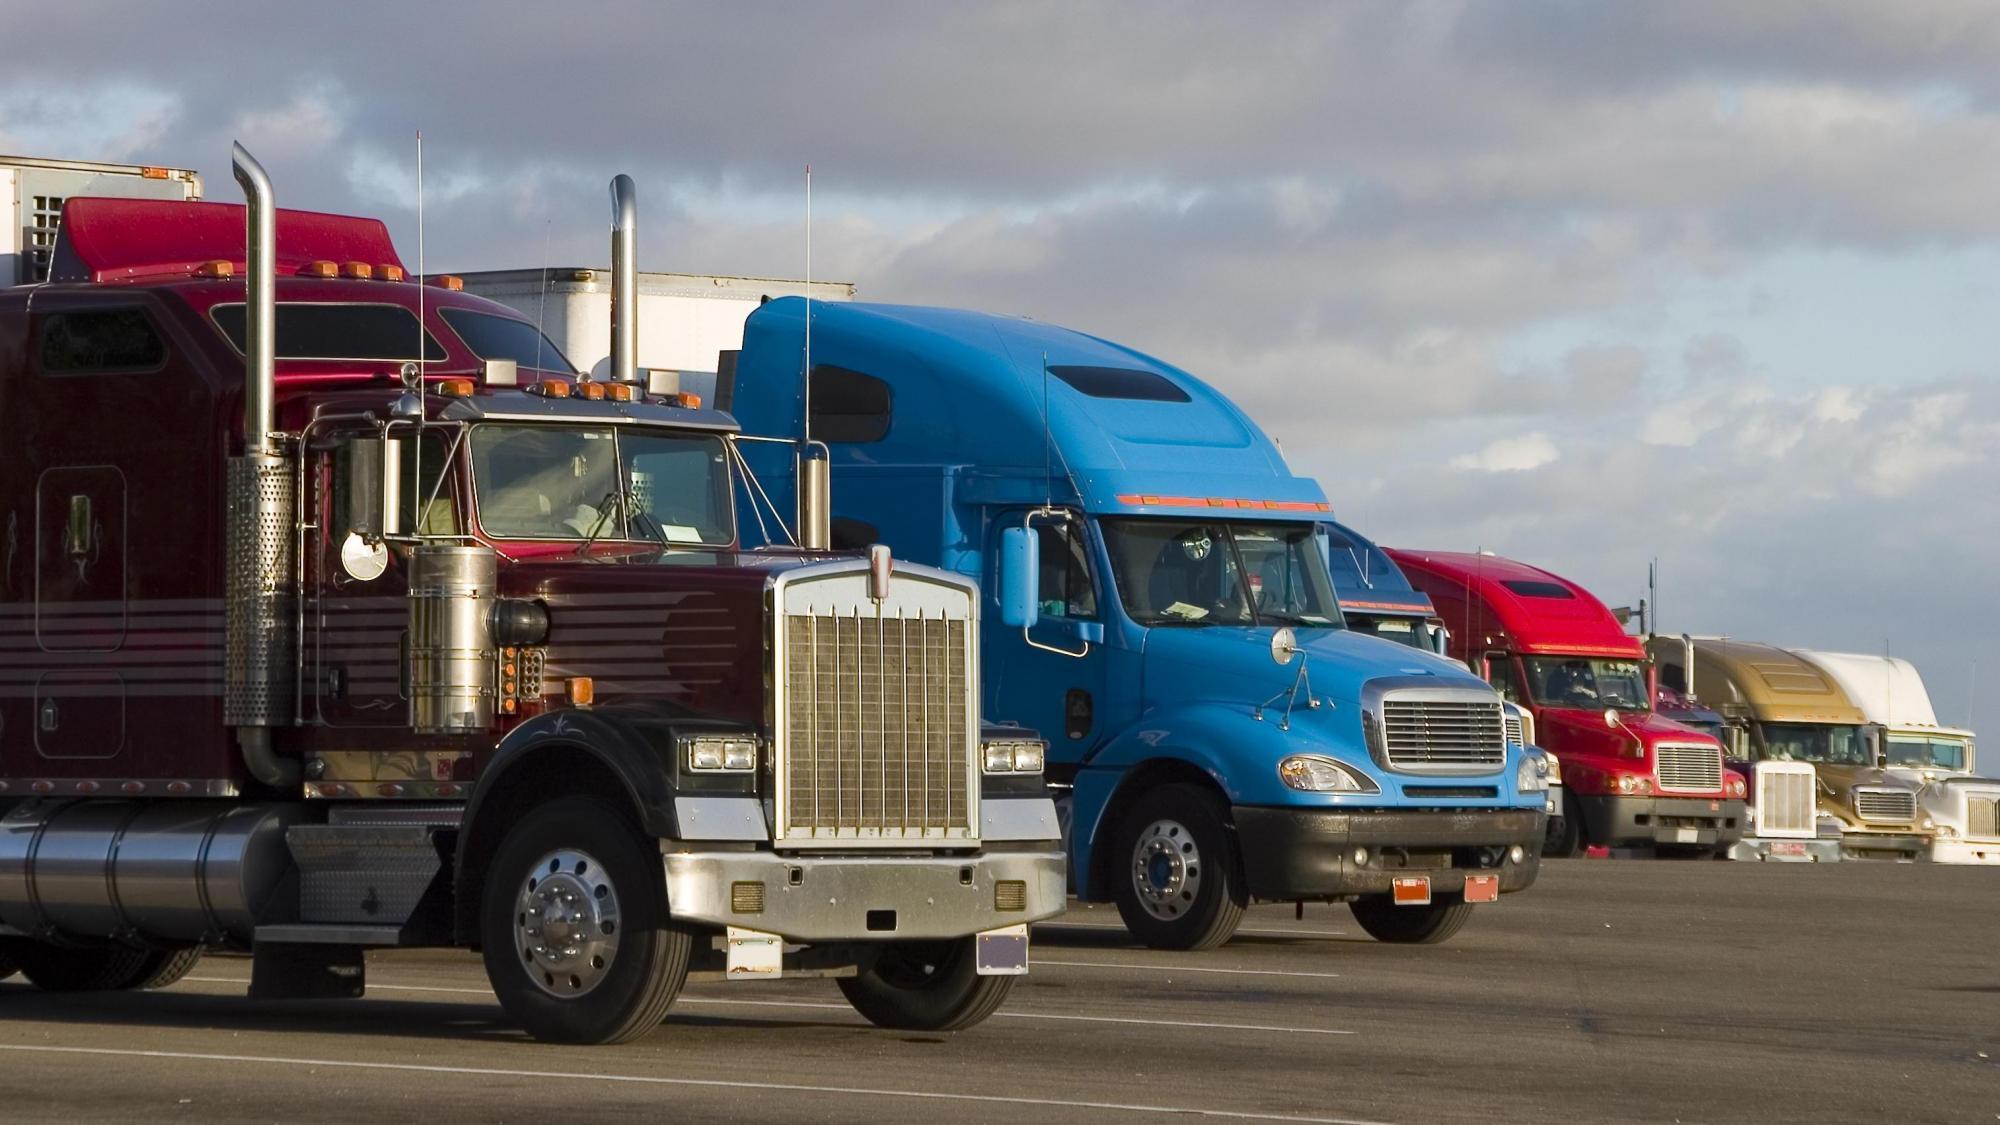 bigstock-Line-Of-Trucks--270815-DMID1-5kvd0ypn6-2000x1125.jpg.2e0f3133ae327abec323e076e8e5ae39.jpg